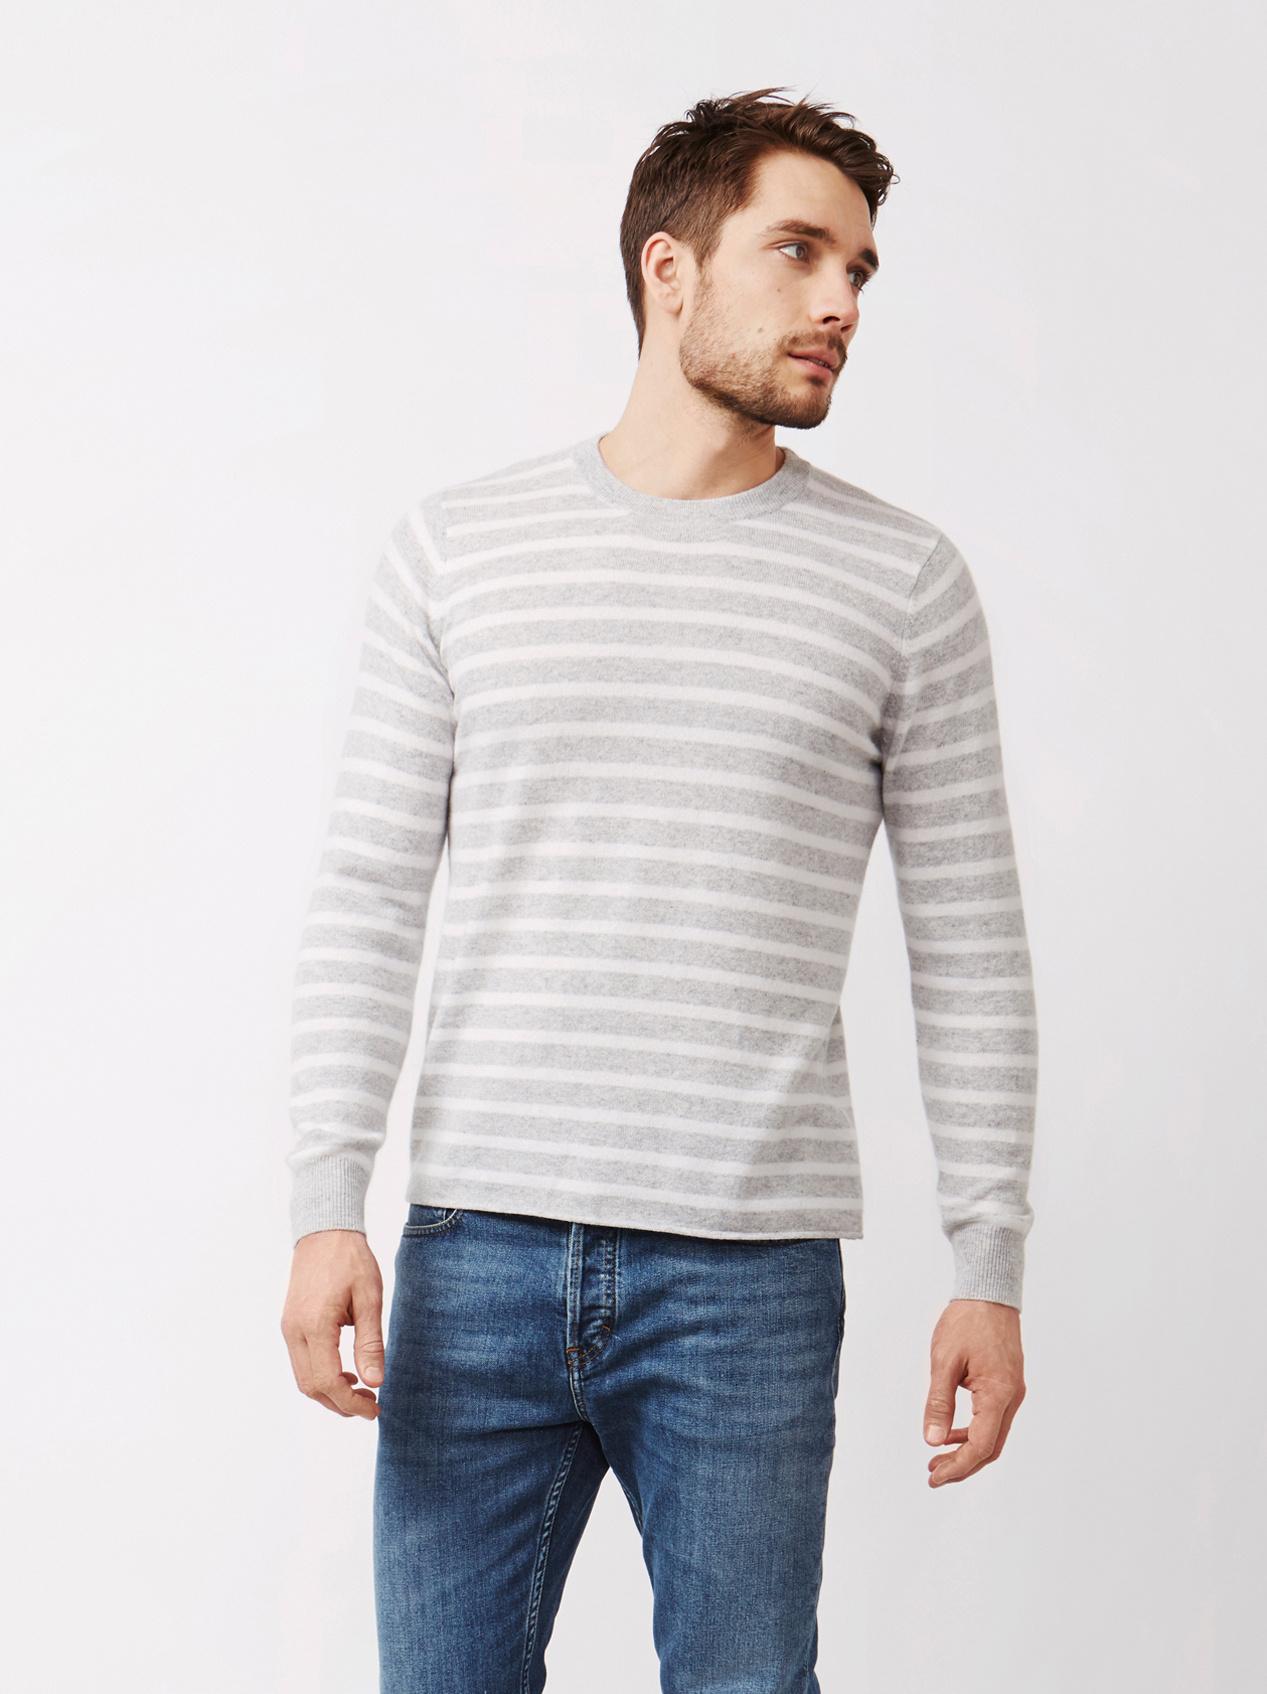 Soft Goat Men's Striped Sweater Light Grey